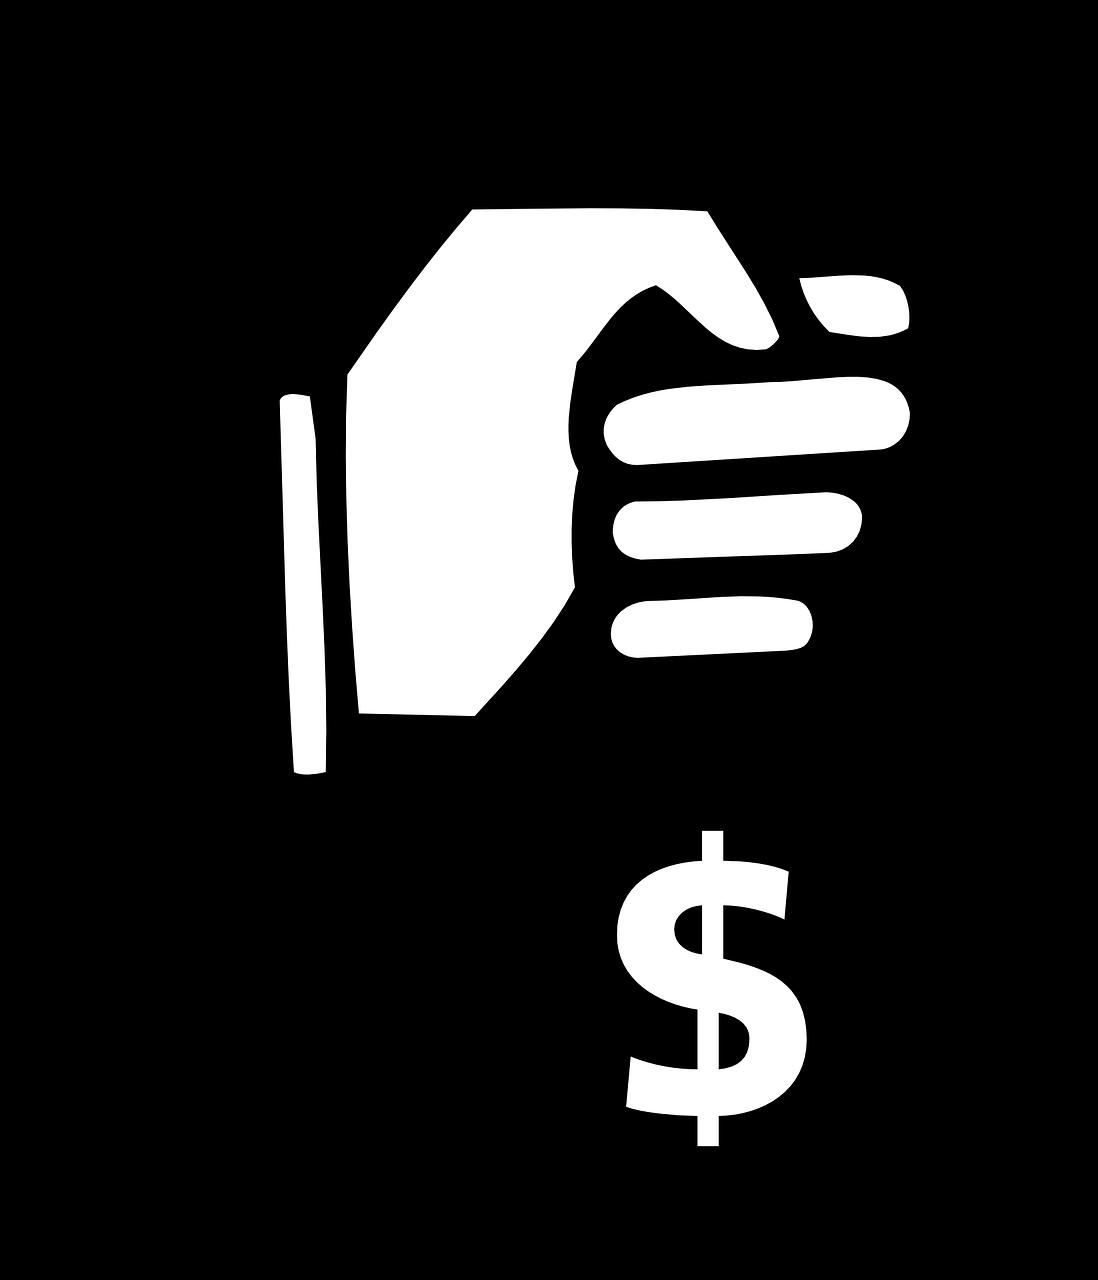 Hand holding money bag